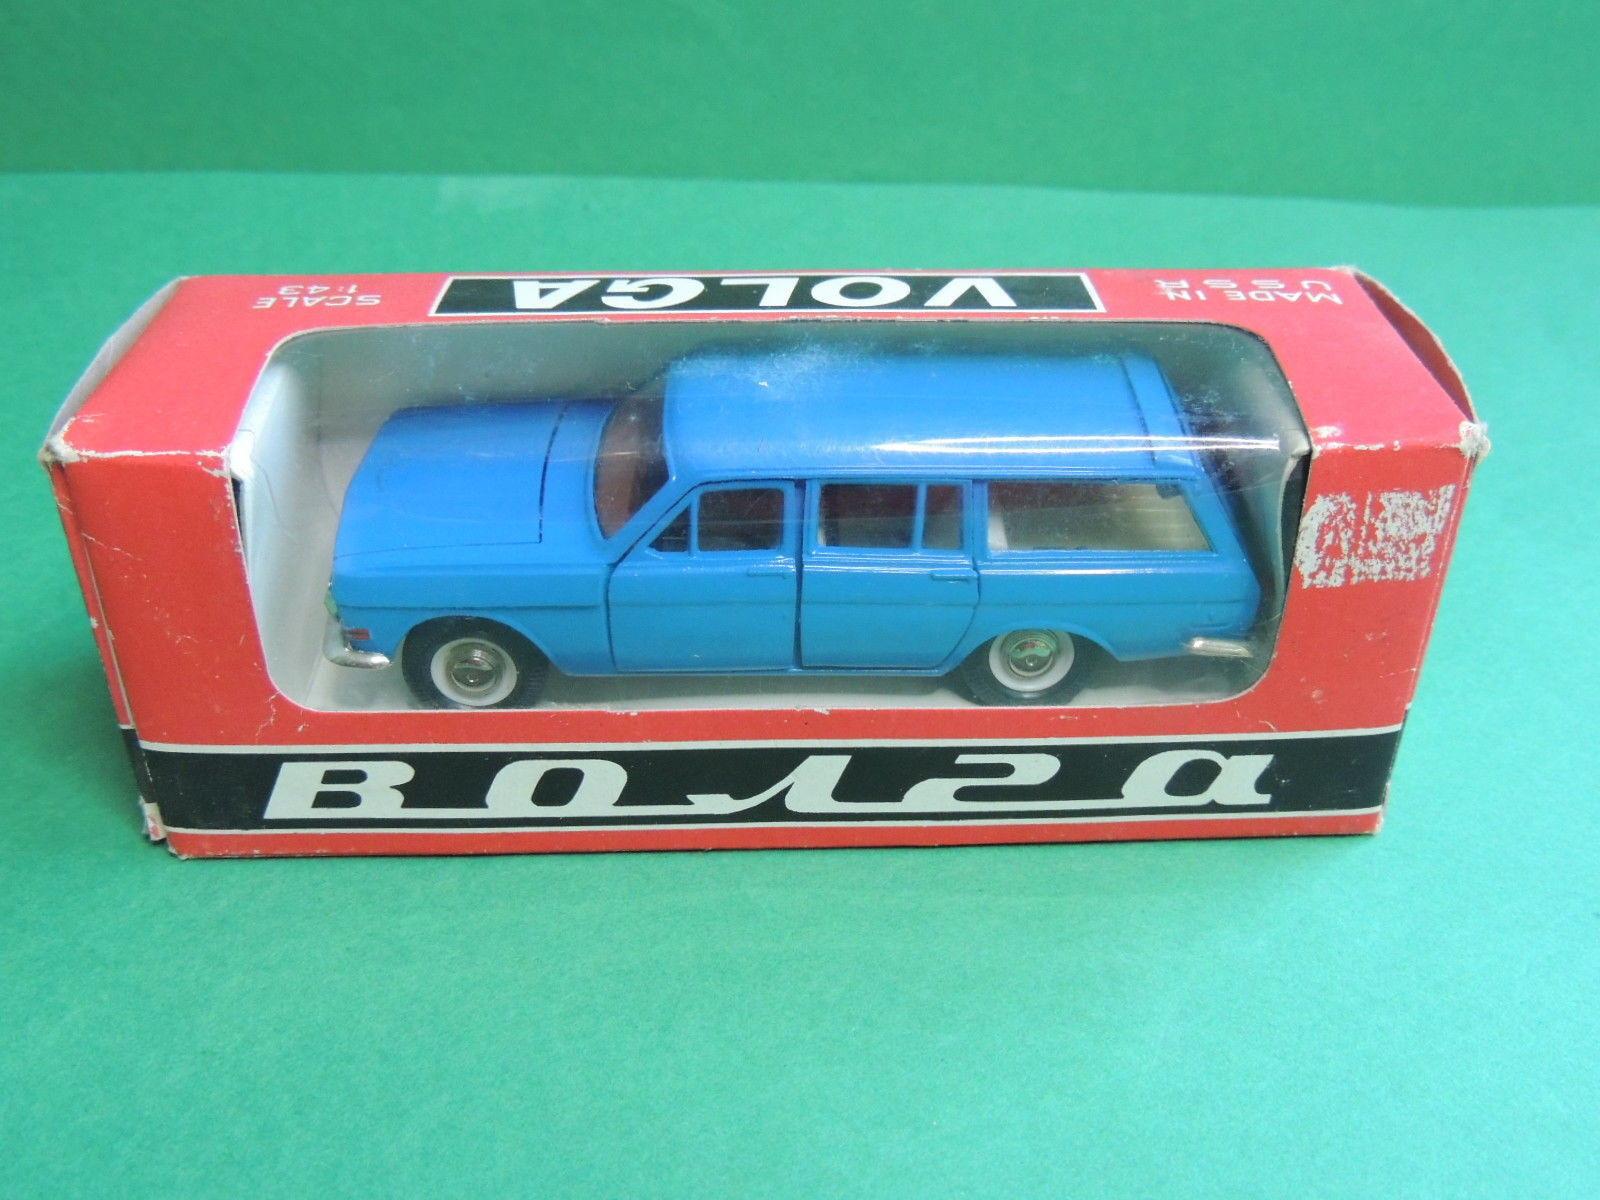 AutoGAZ Volga scale model GAZ-24-02 voiture russian azul car URSS CCCP USSR